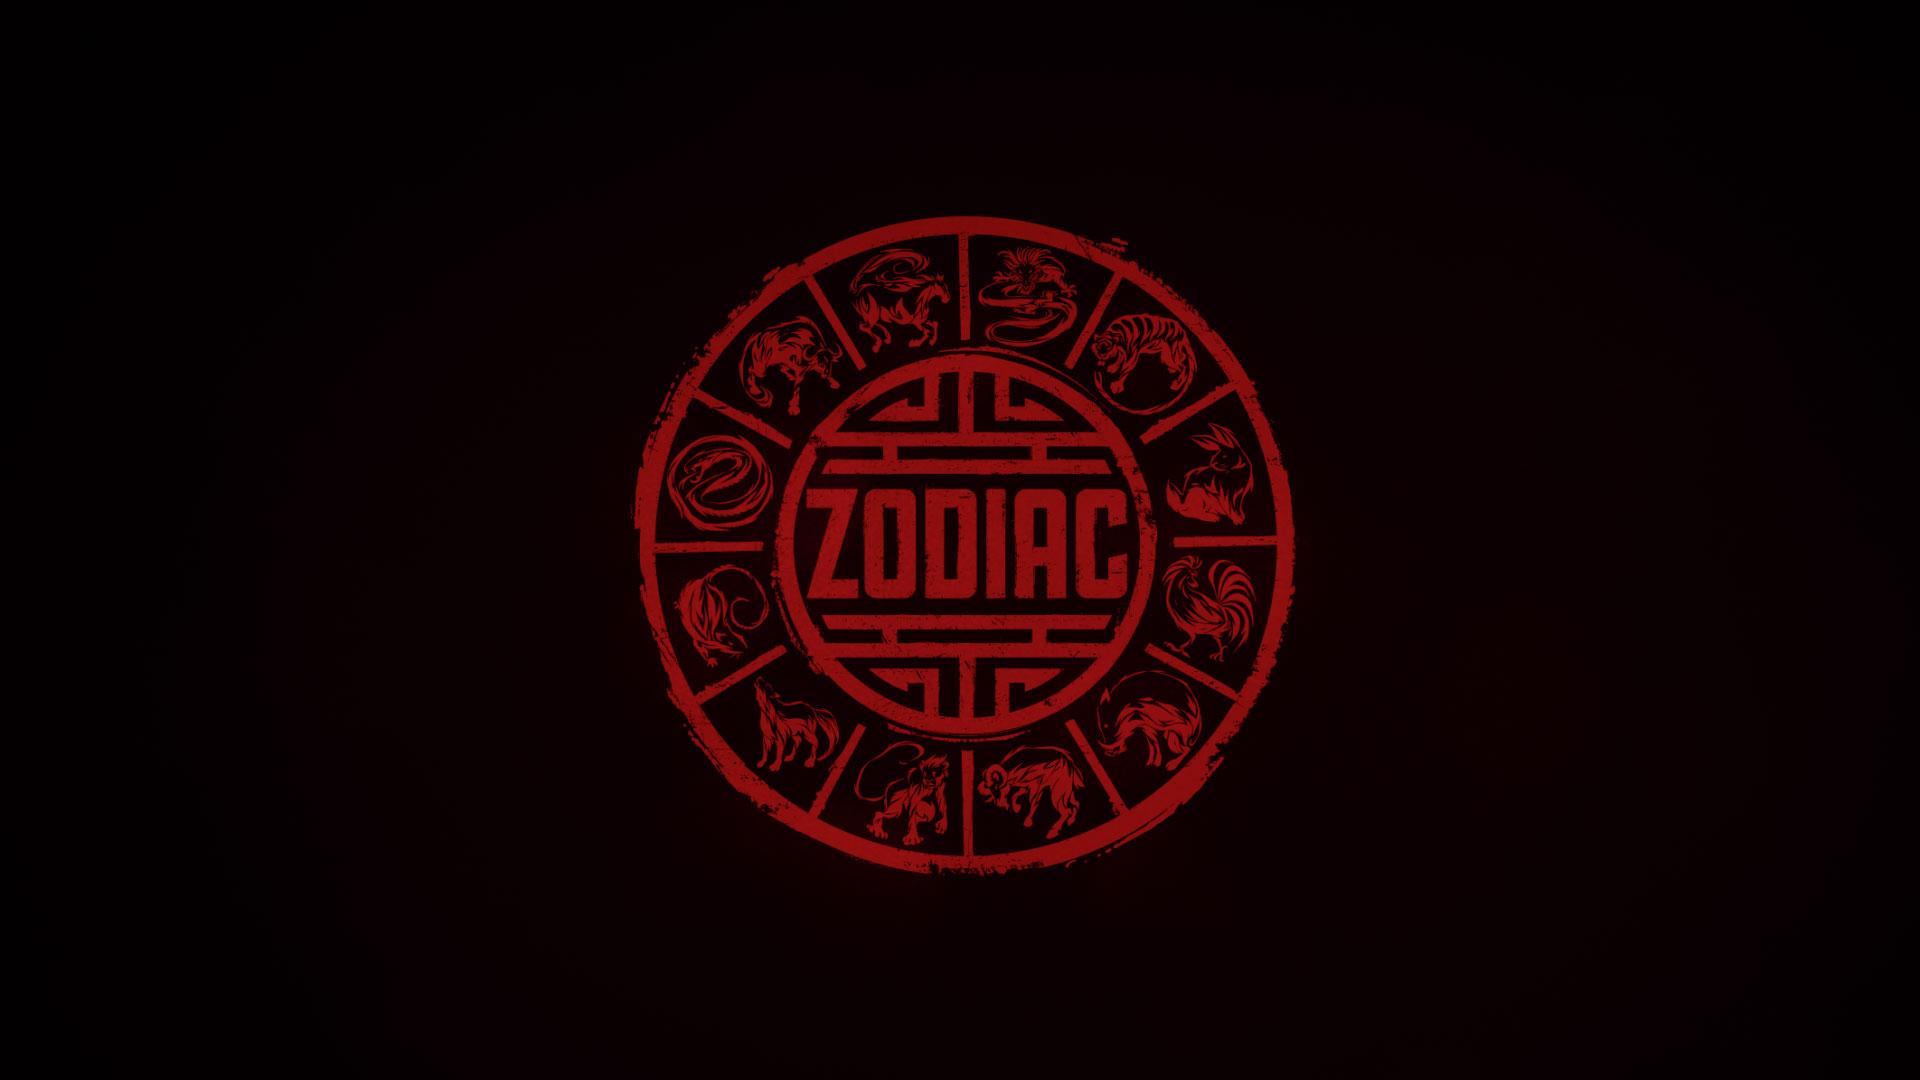 "<a href=""/zodiac"">Zodiac</a>"